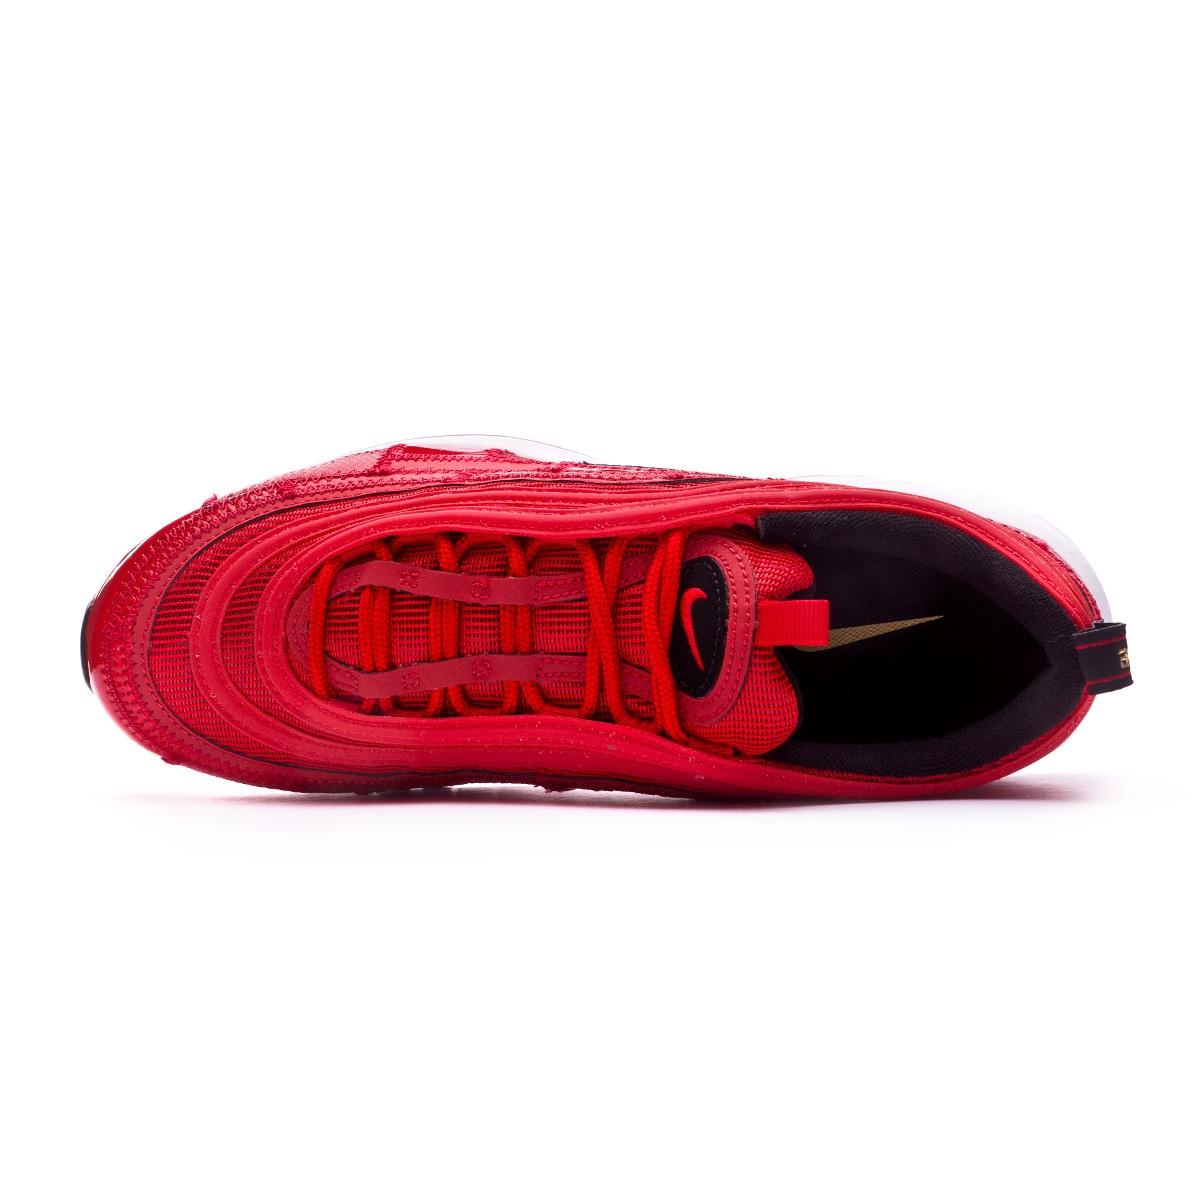 c8d17e83b5f3 Trainers Nike Air Max 97 CR7 University red-Metallic gold-Fir-White -  Football store Fútbol Emotion